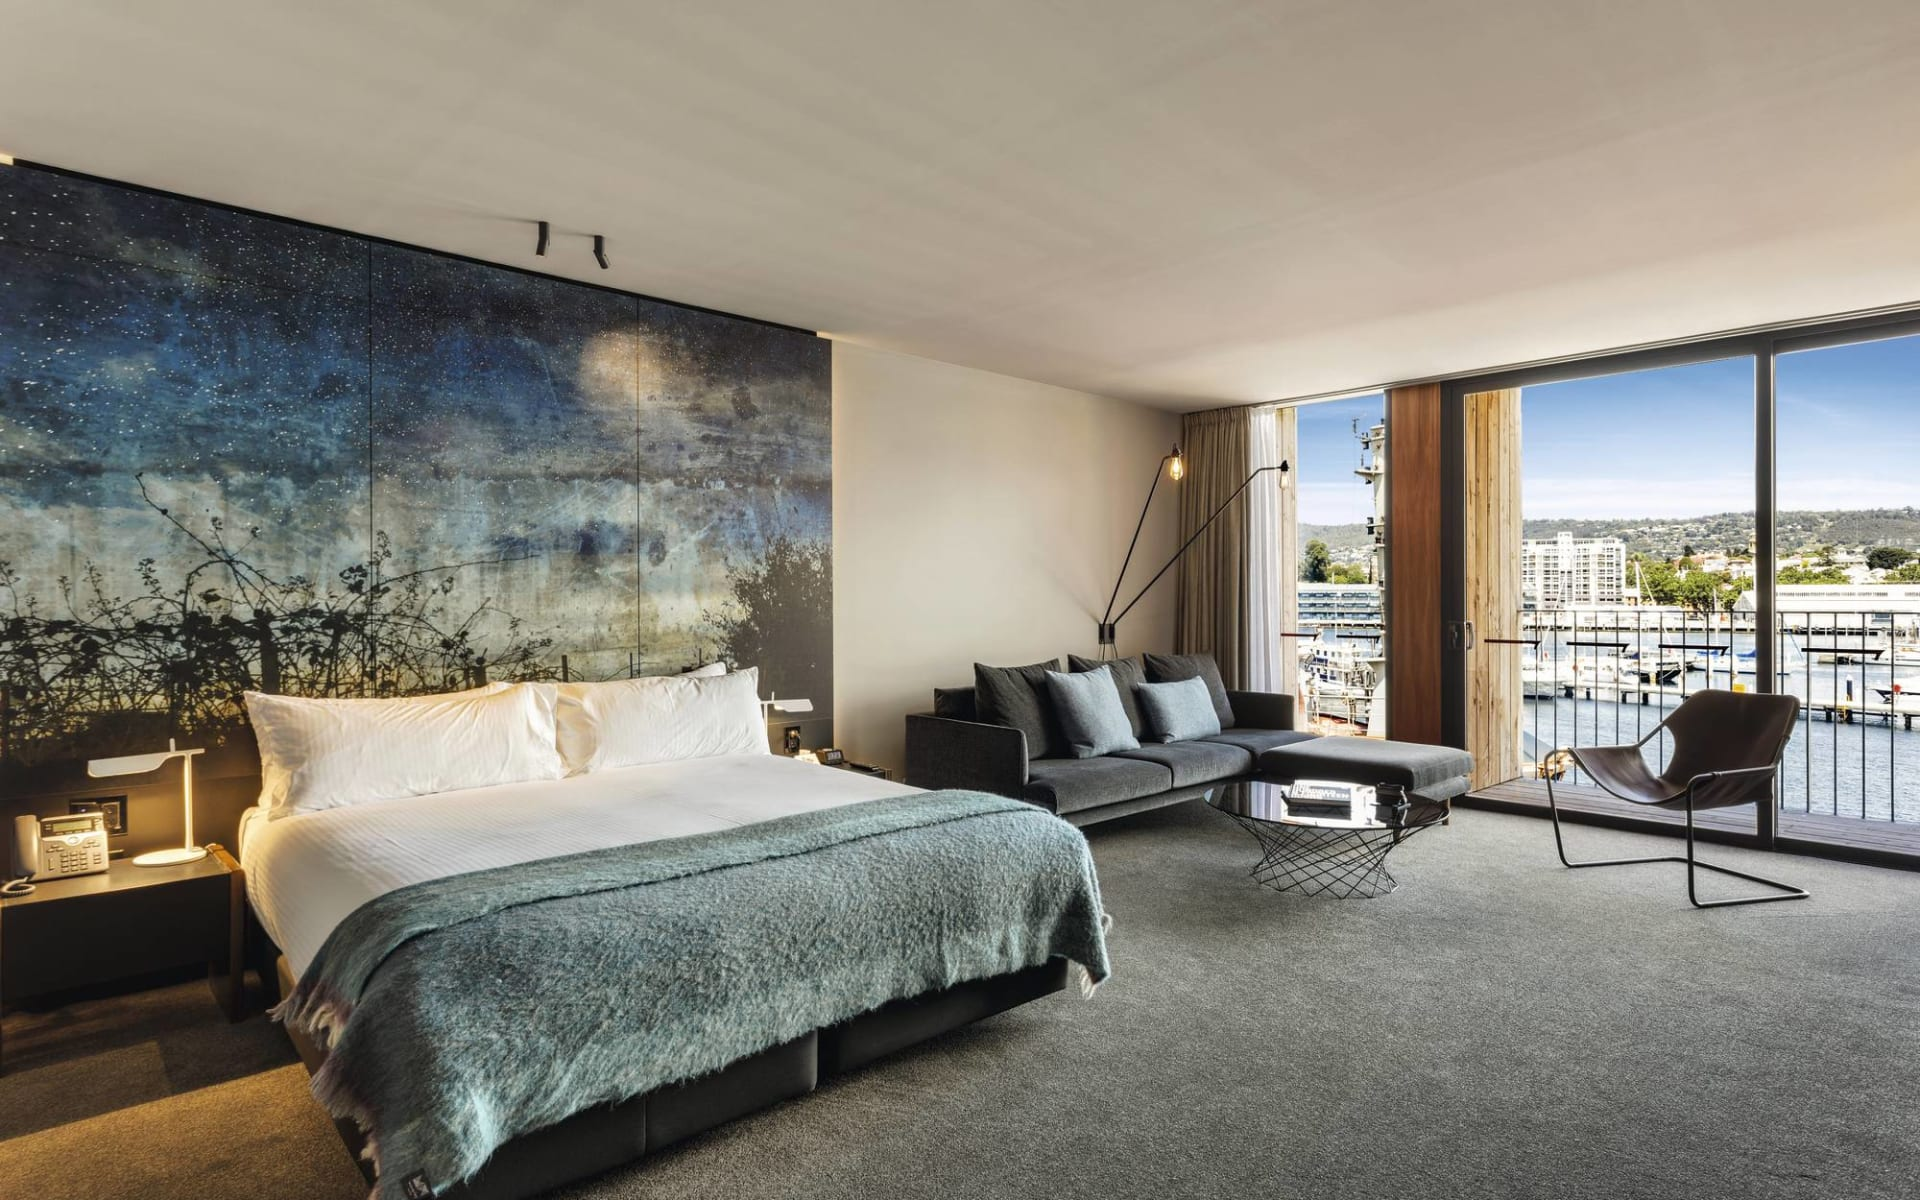 Macq 01 in Hobart:  Macq01 Hobart - Superior Waterfront Zimmer 2019